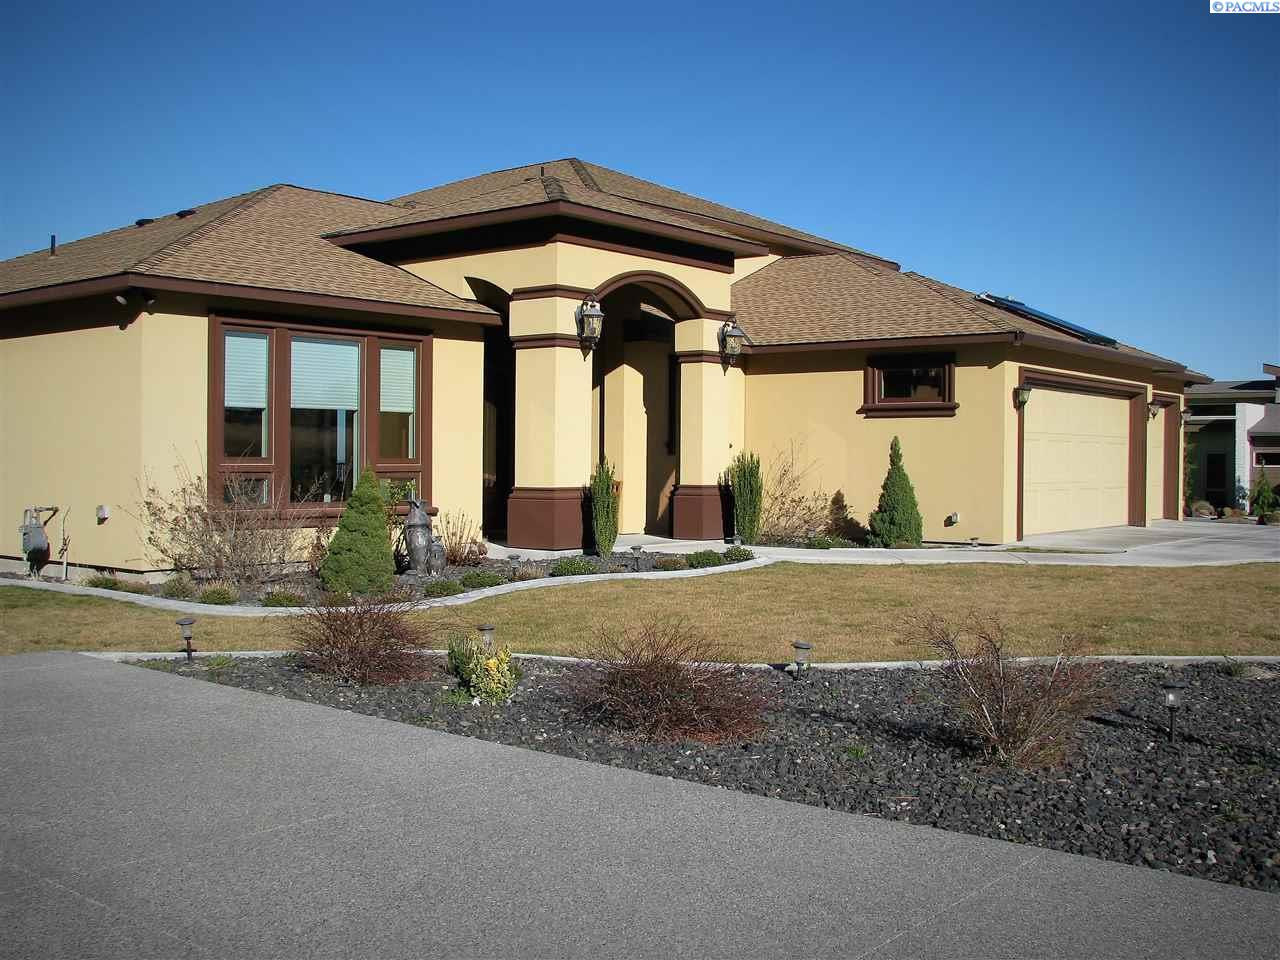 Single Family Home for Sale at 1261 Plateau Dr 1261 Plateau Dr Richland, Washington 99352 United States